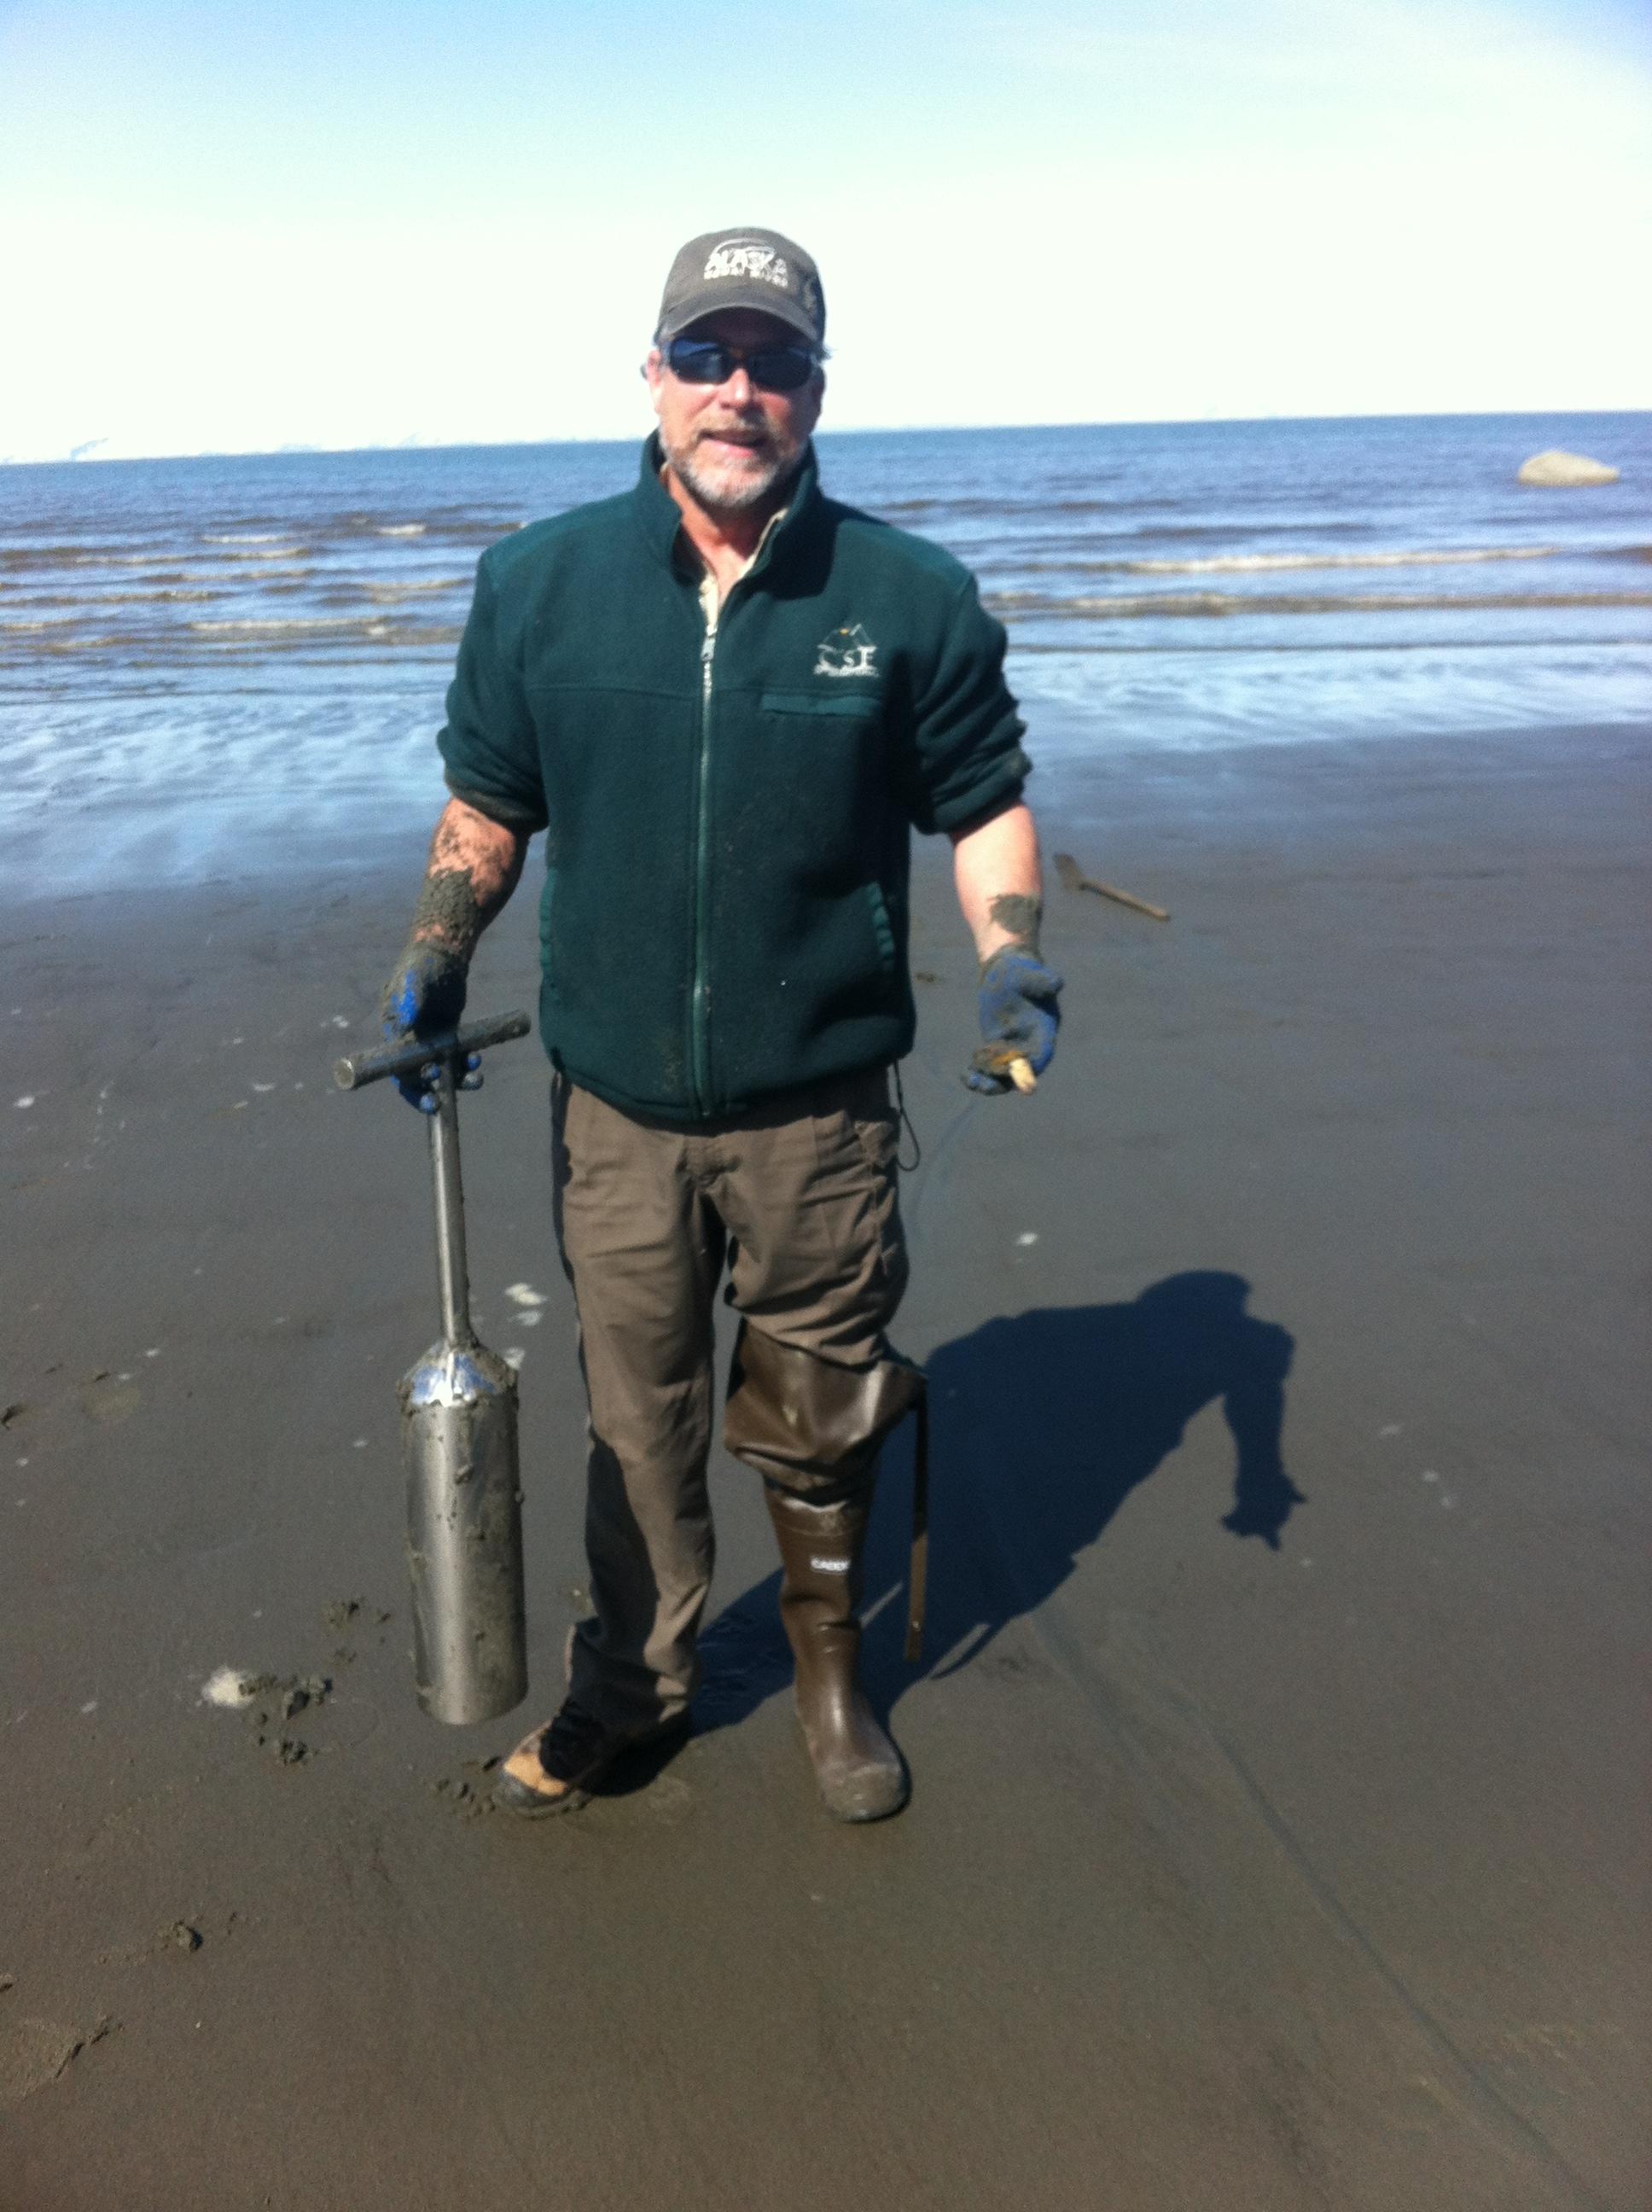 Deep Creek on the Shore using a Shotgun Shovel for digging Razor Clams - AK